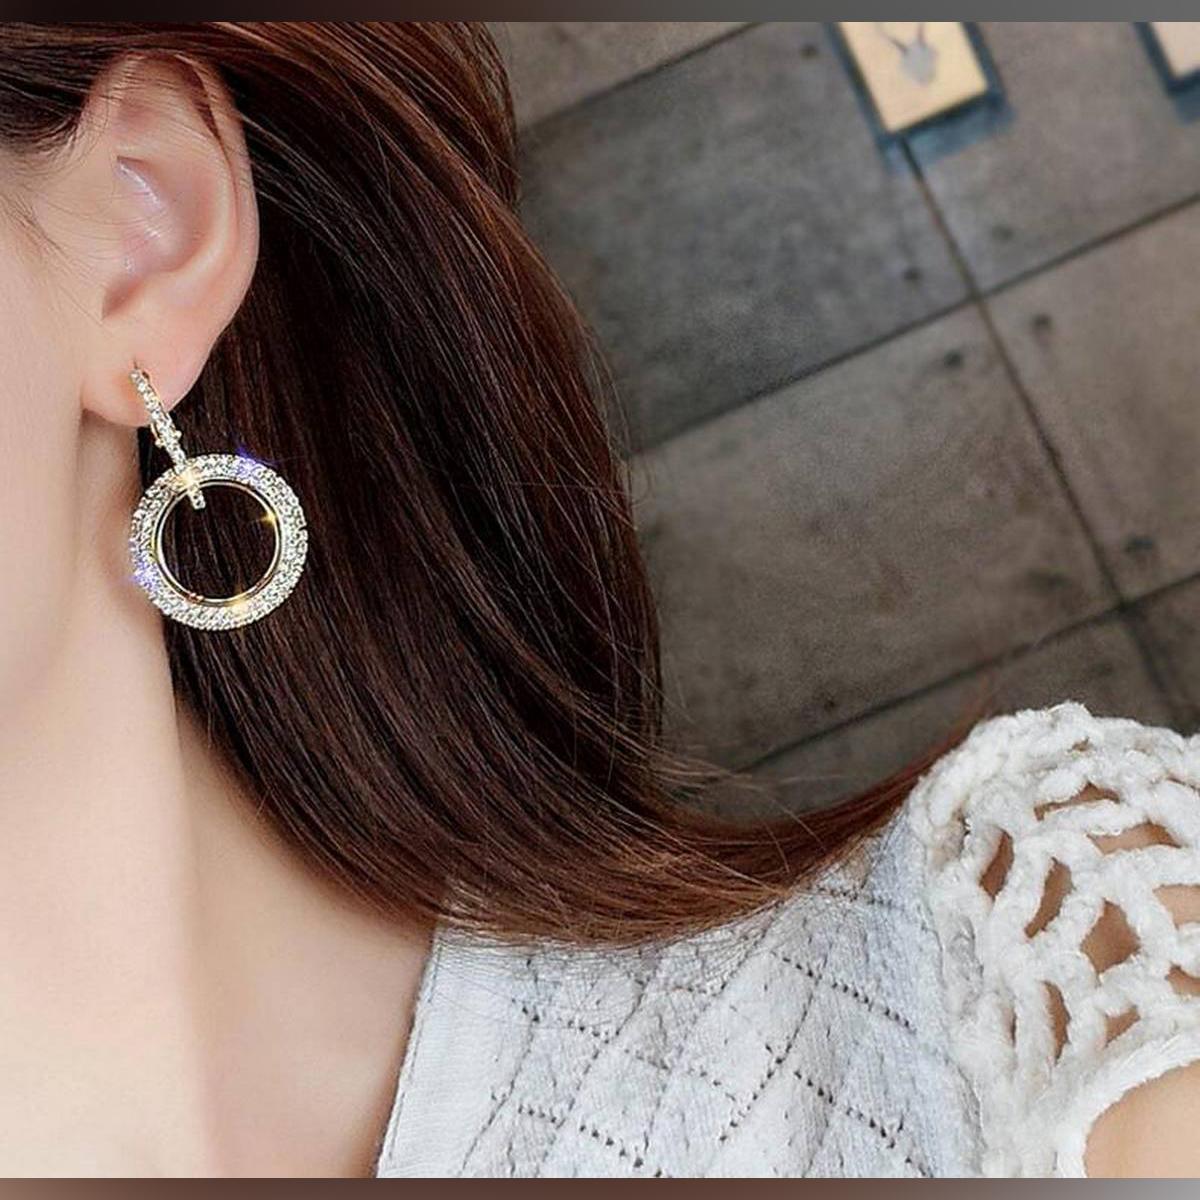 Handmade elegant earring new interlocking double hoop circle earrings making charms for women